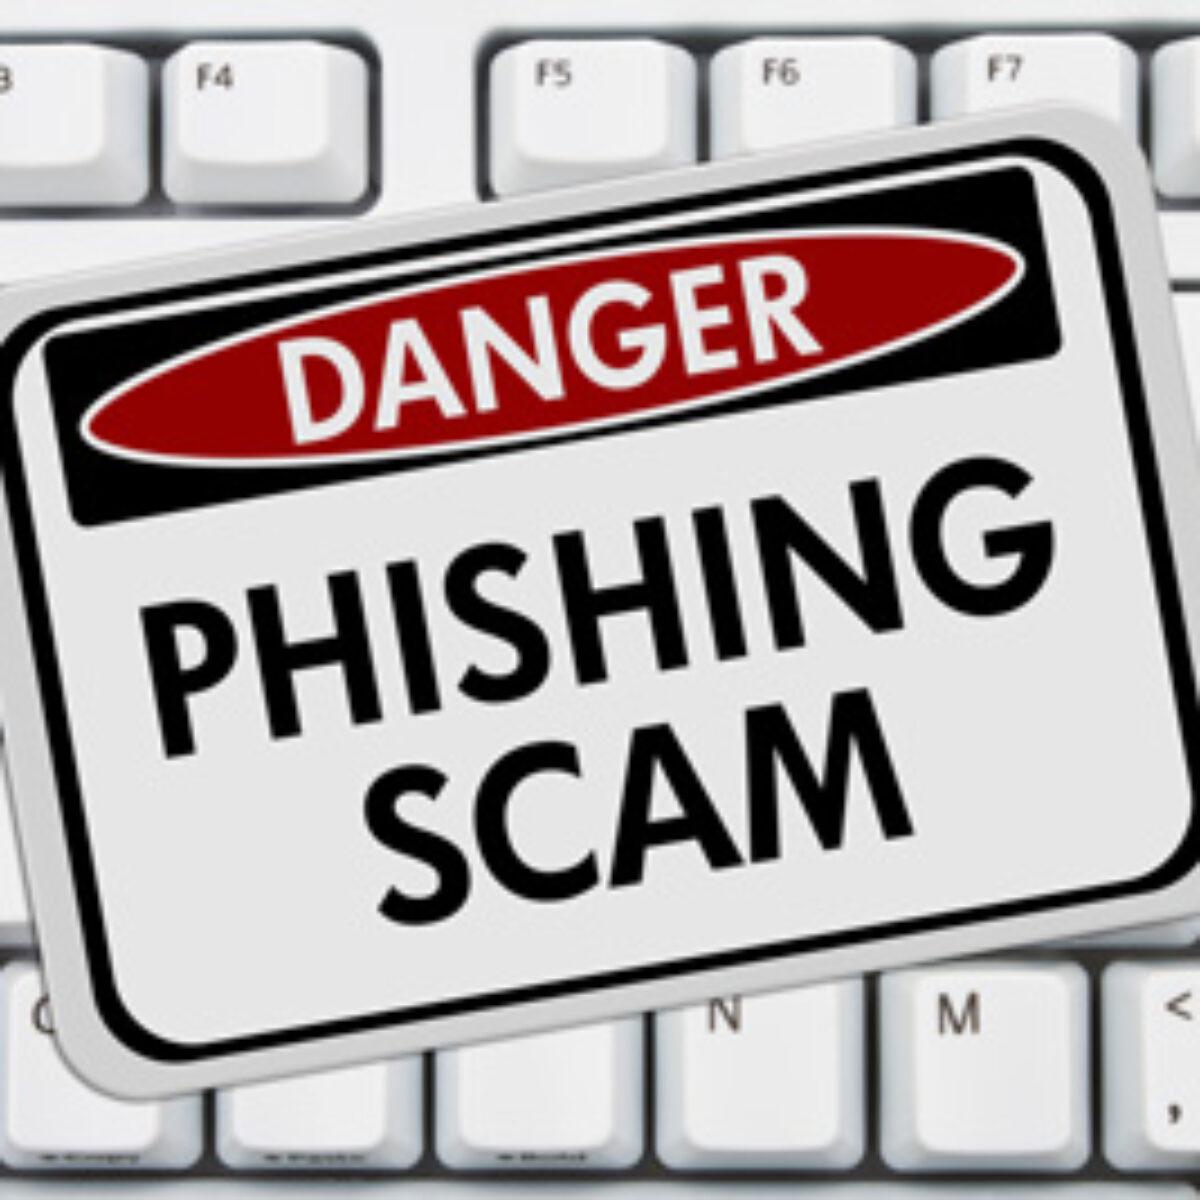 scam-ppp-phishing-400